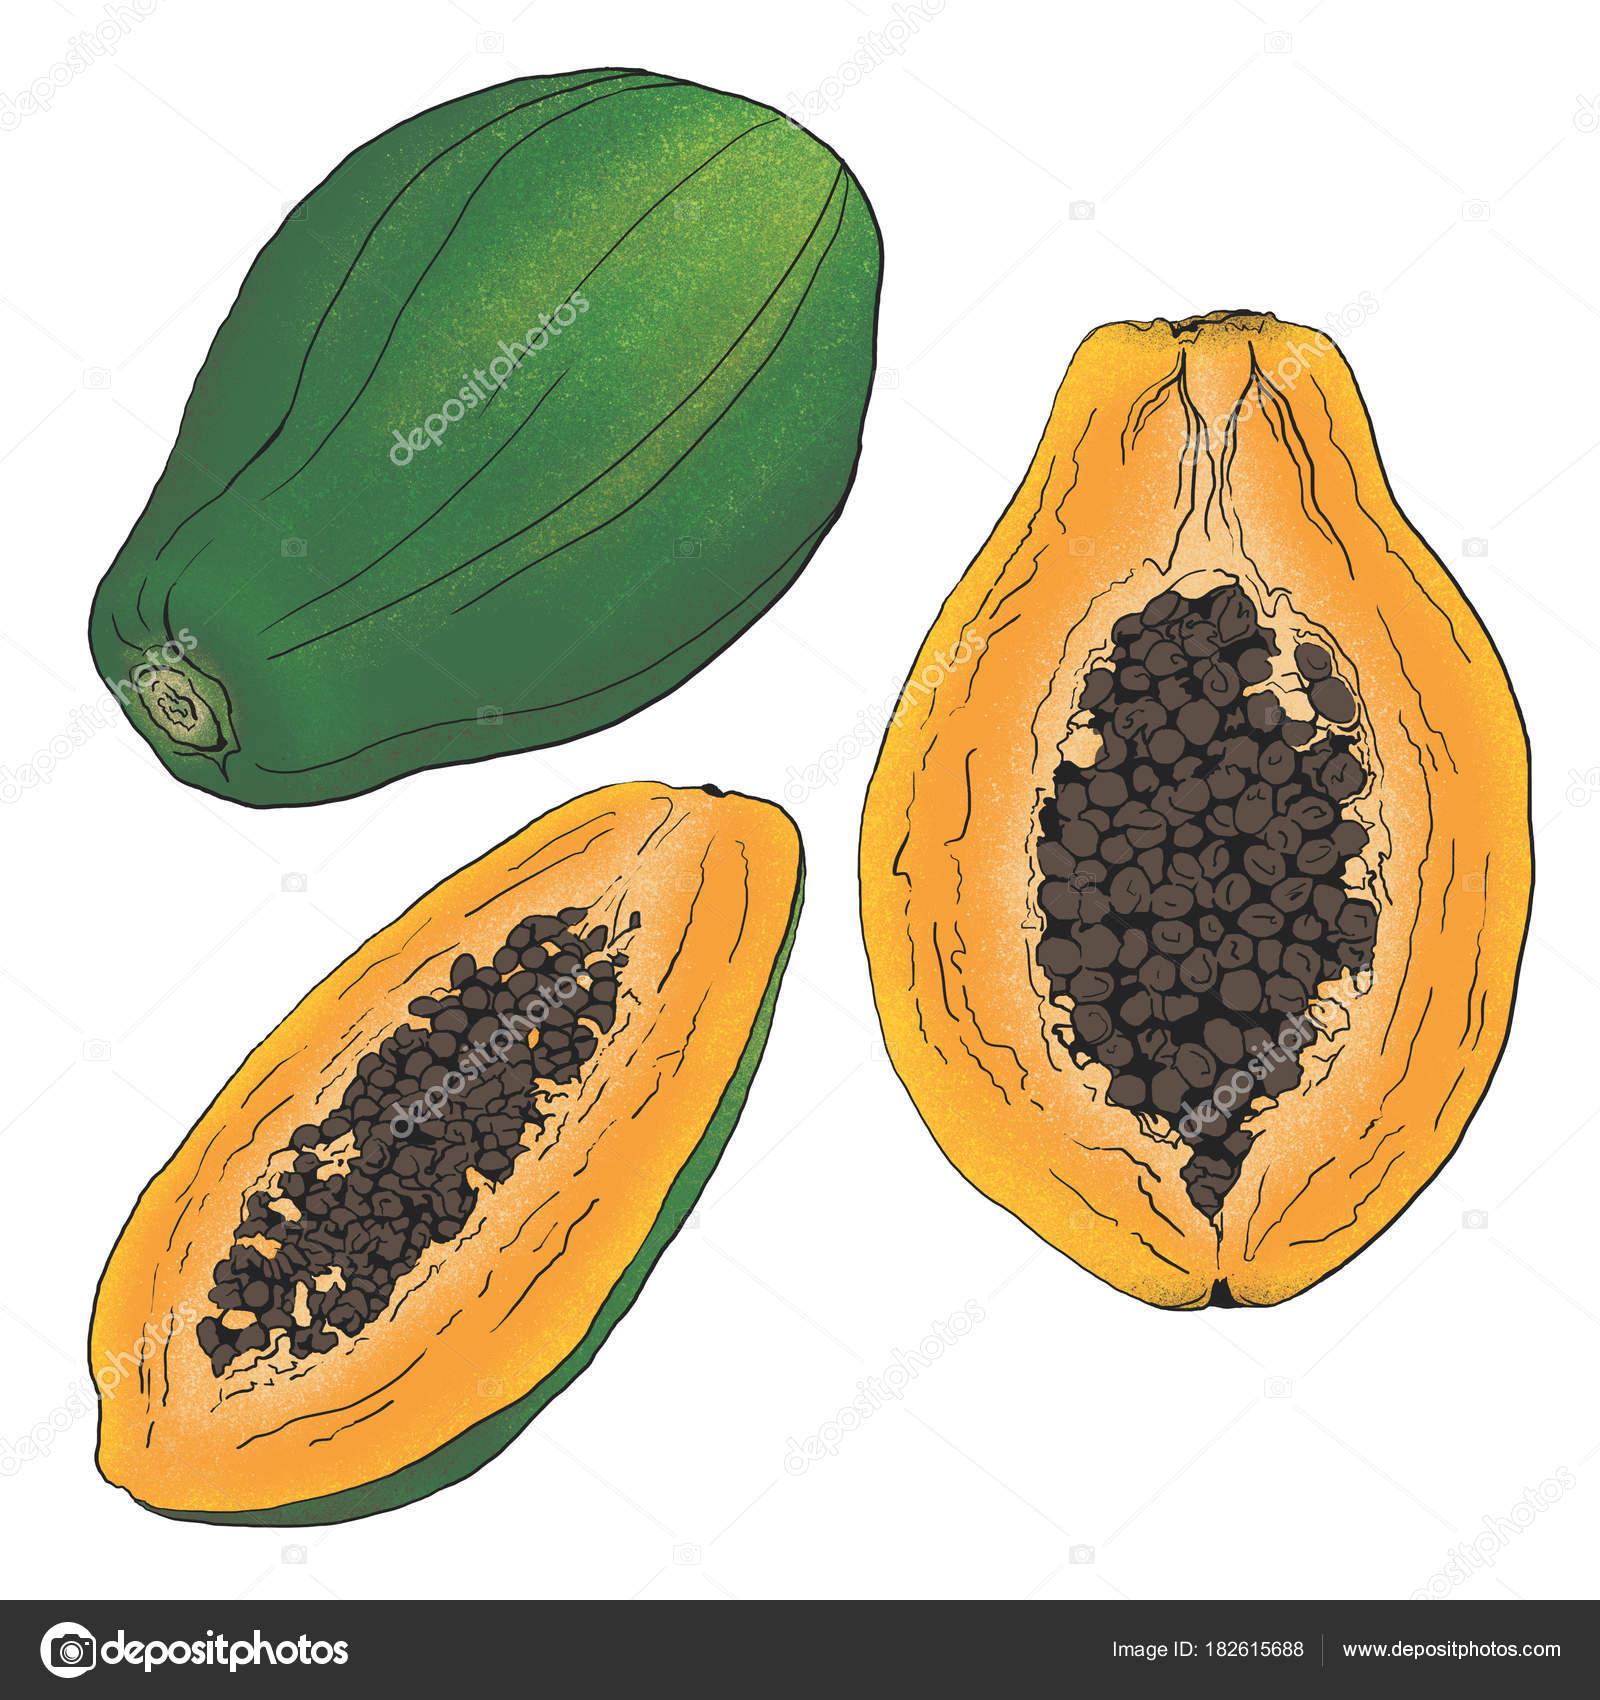 Abbildung Papaya Früchte Farben — Stockfoto © timosvika #182615688